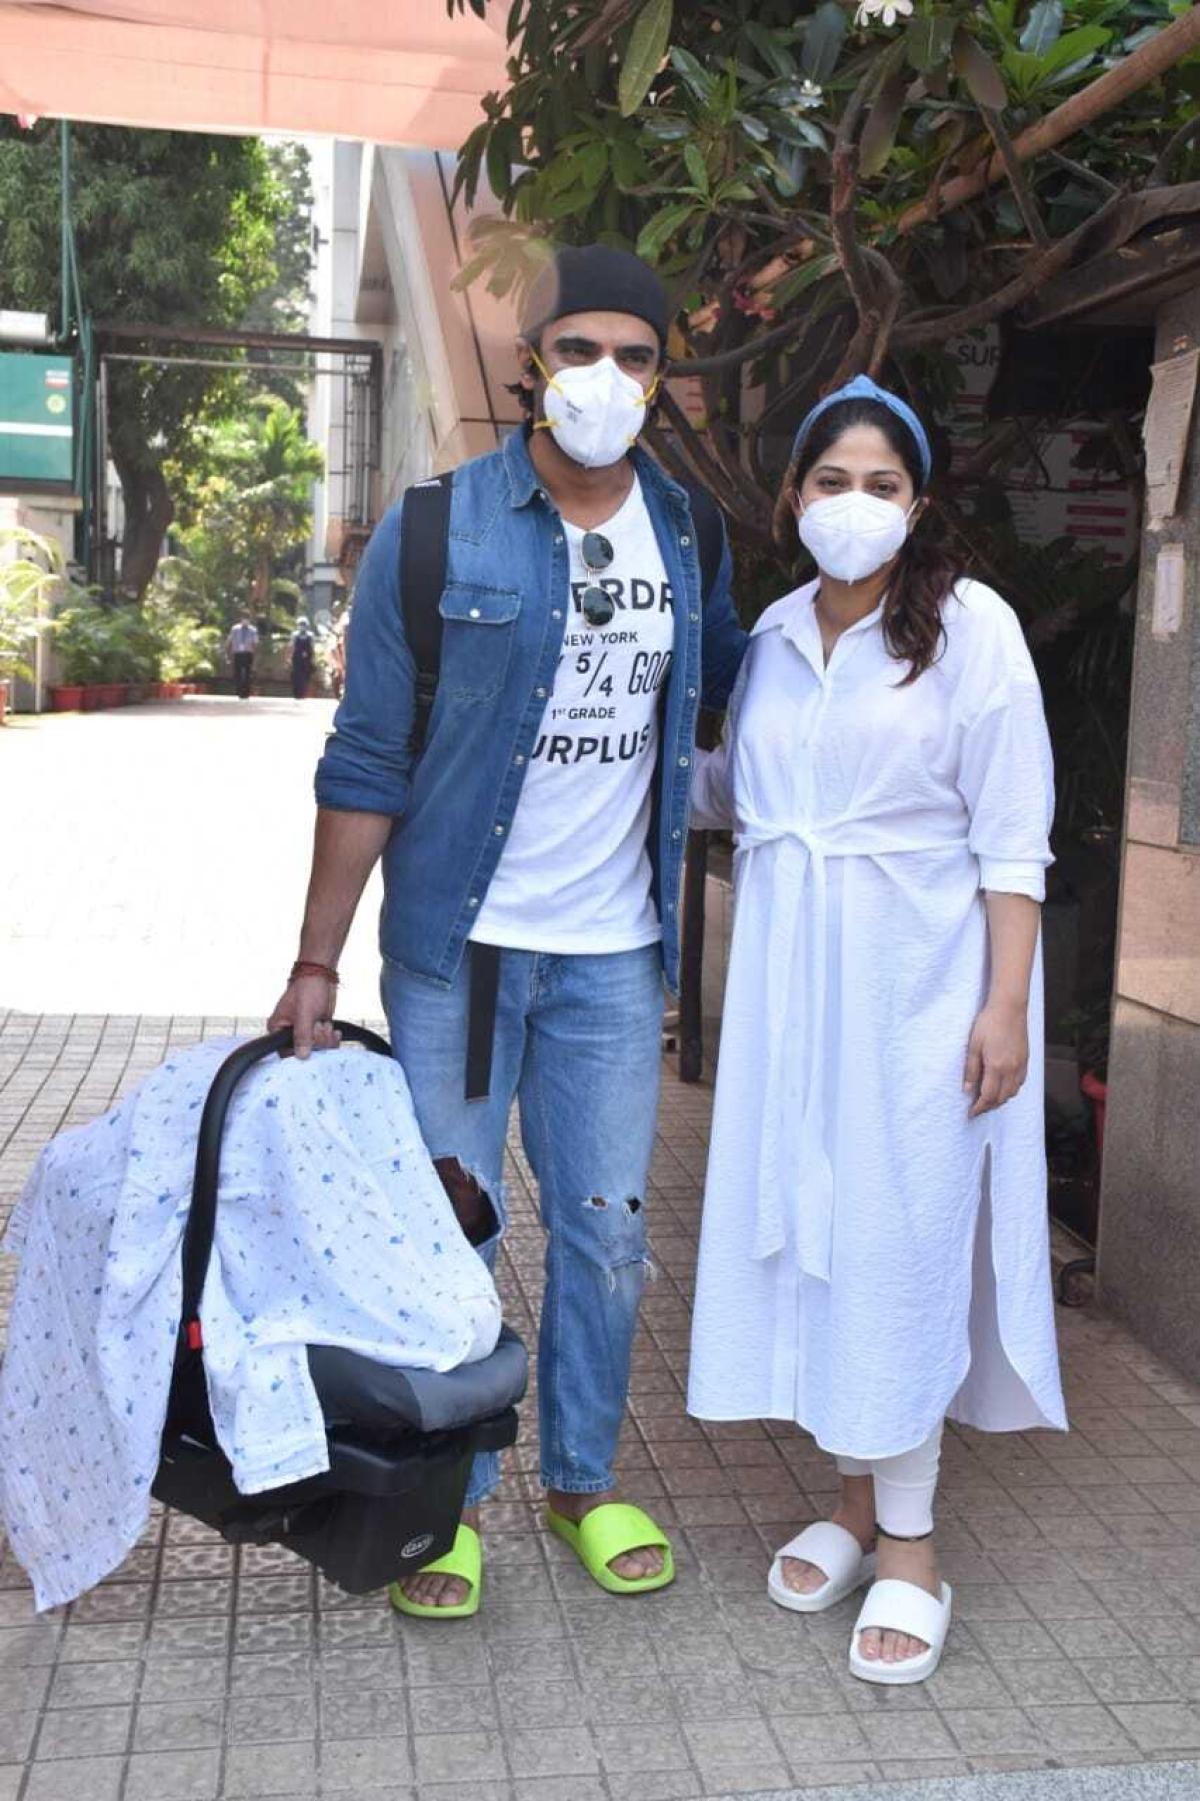 In Pics: Mohit Malik and Addite Shirwaikar spotted with their newborn in Mumbai